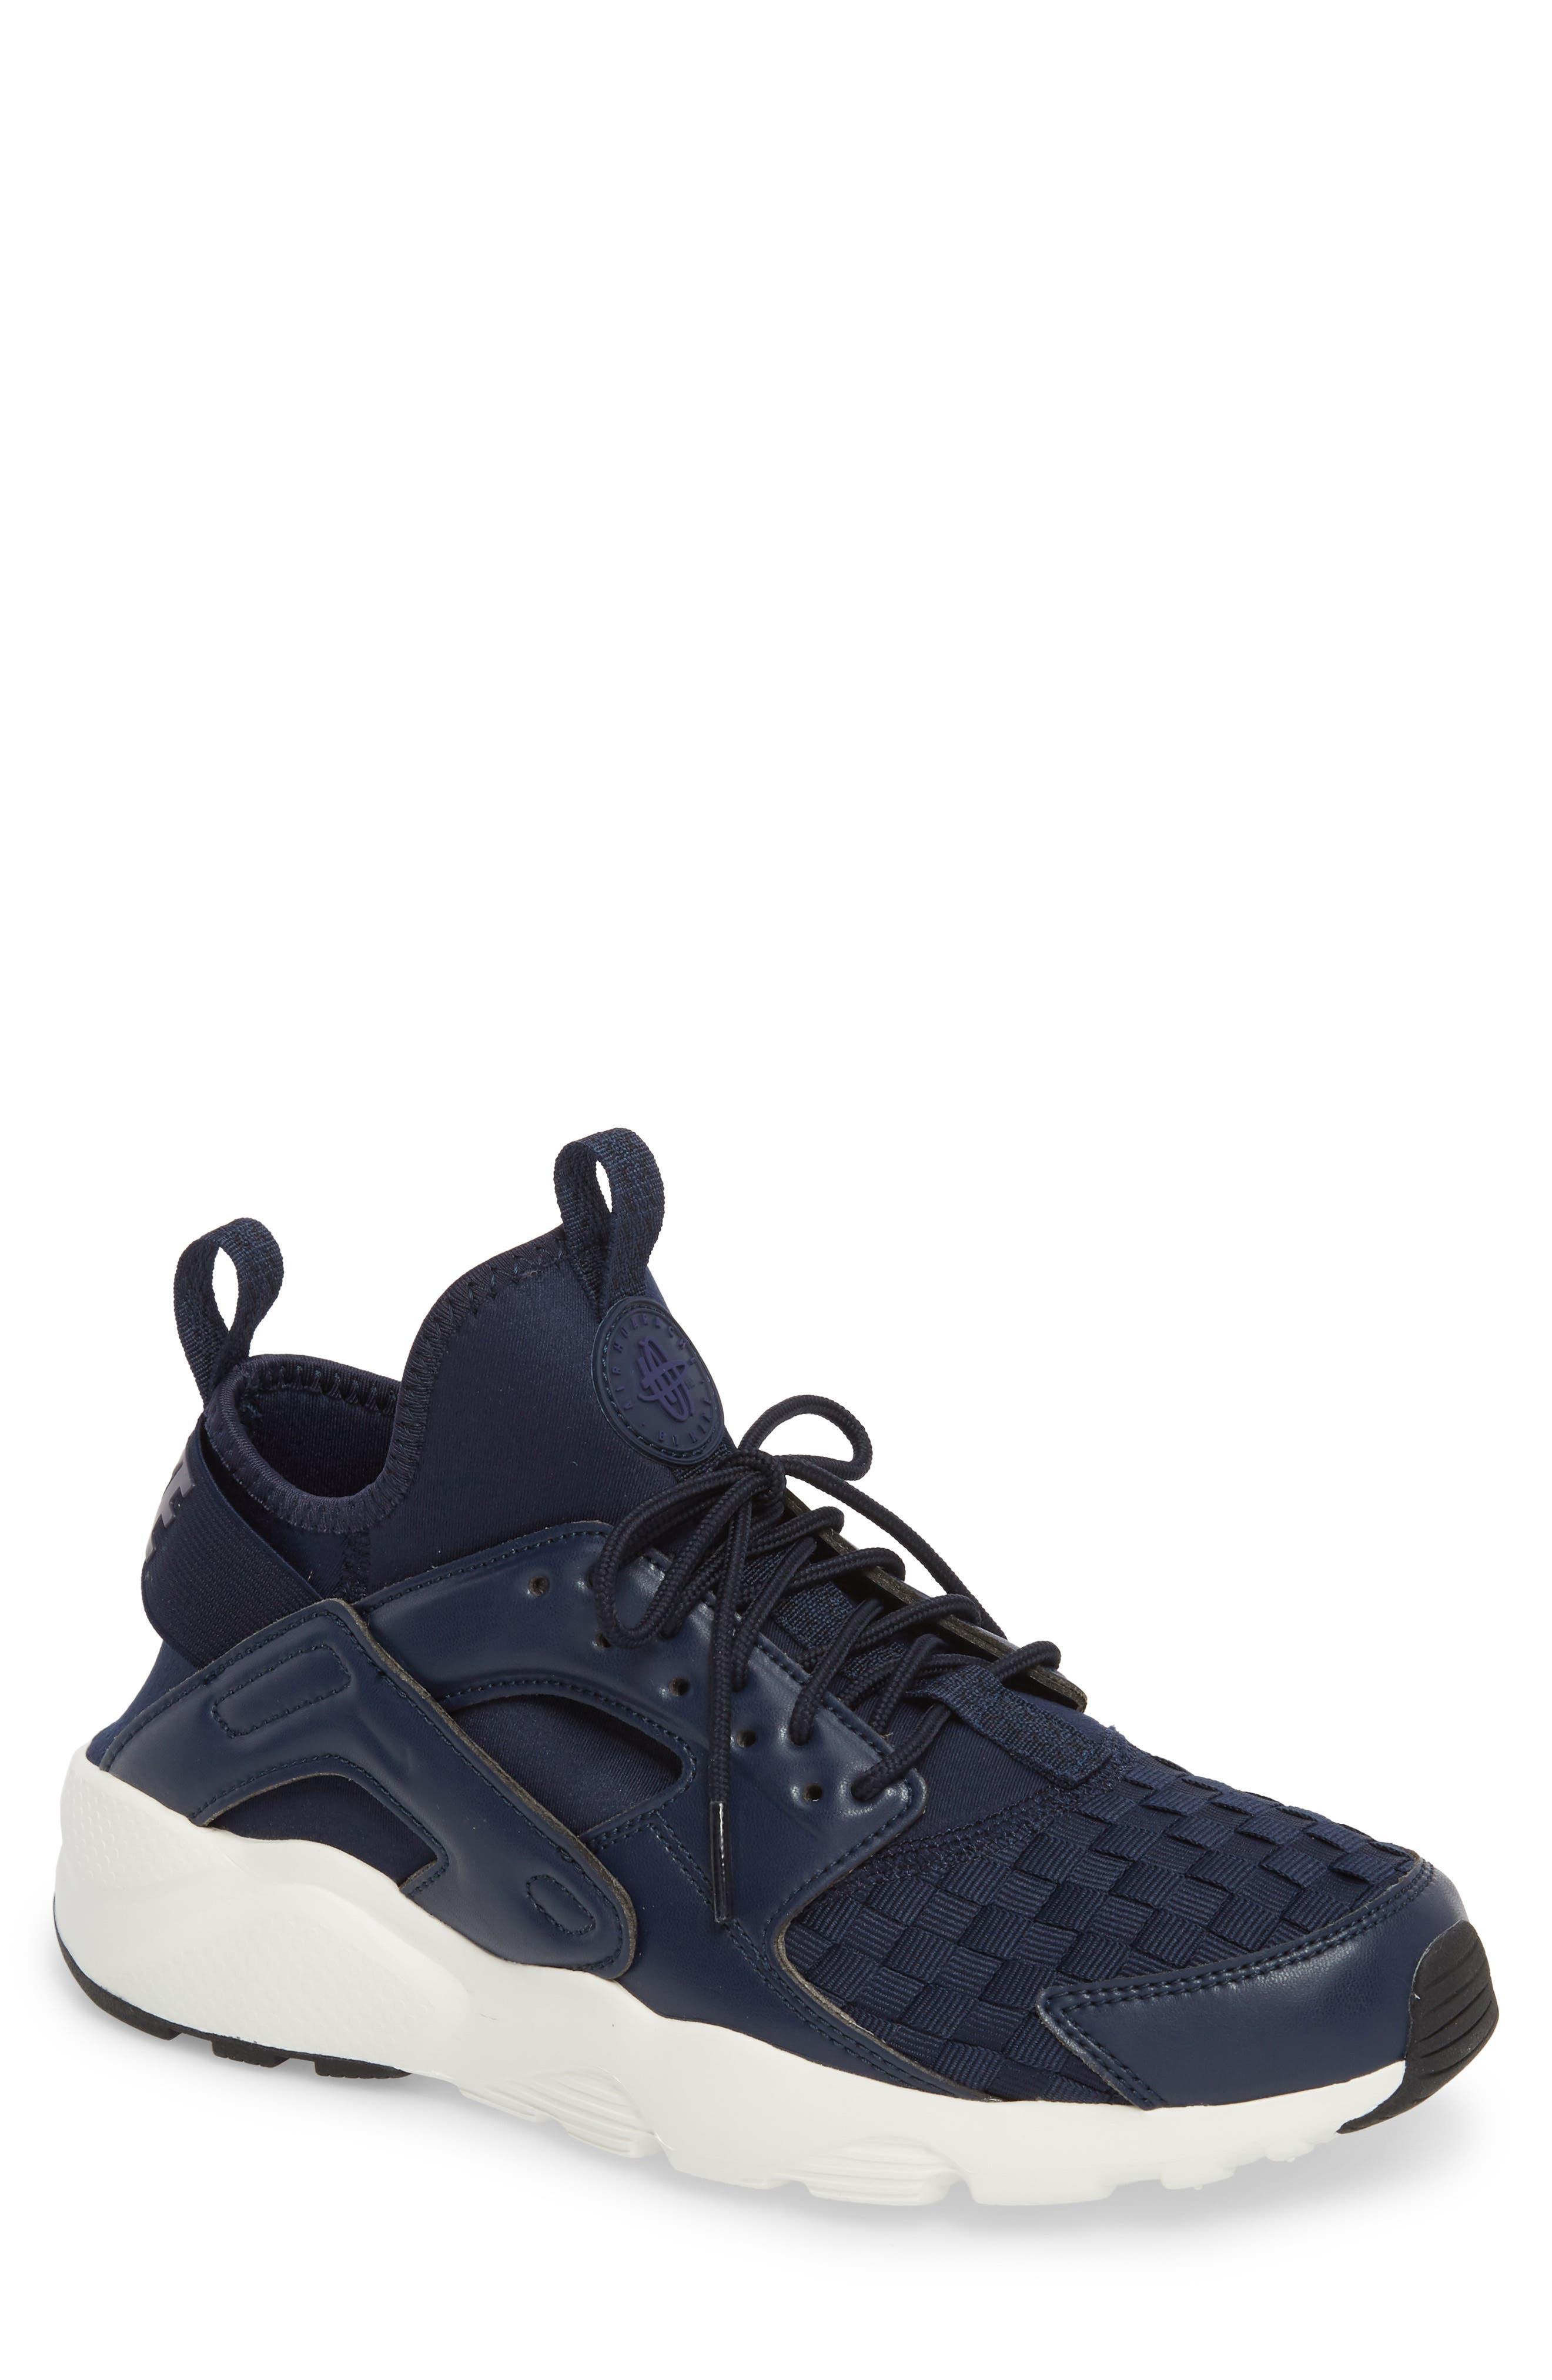 Nike Air Huarache Run Ultra SE Sneaker (Men)